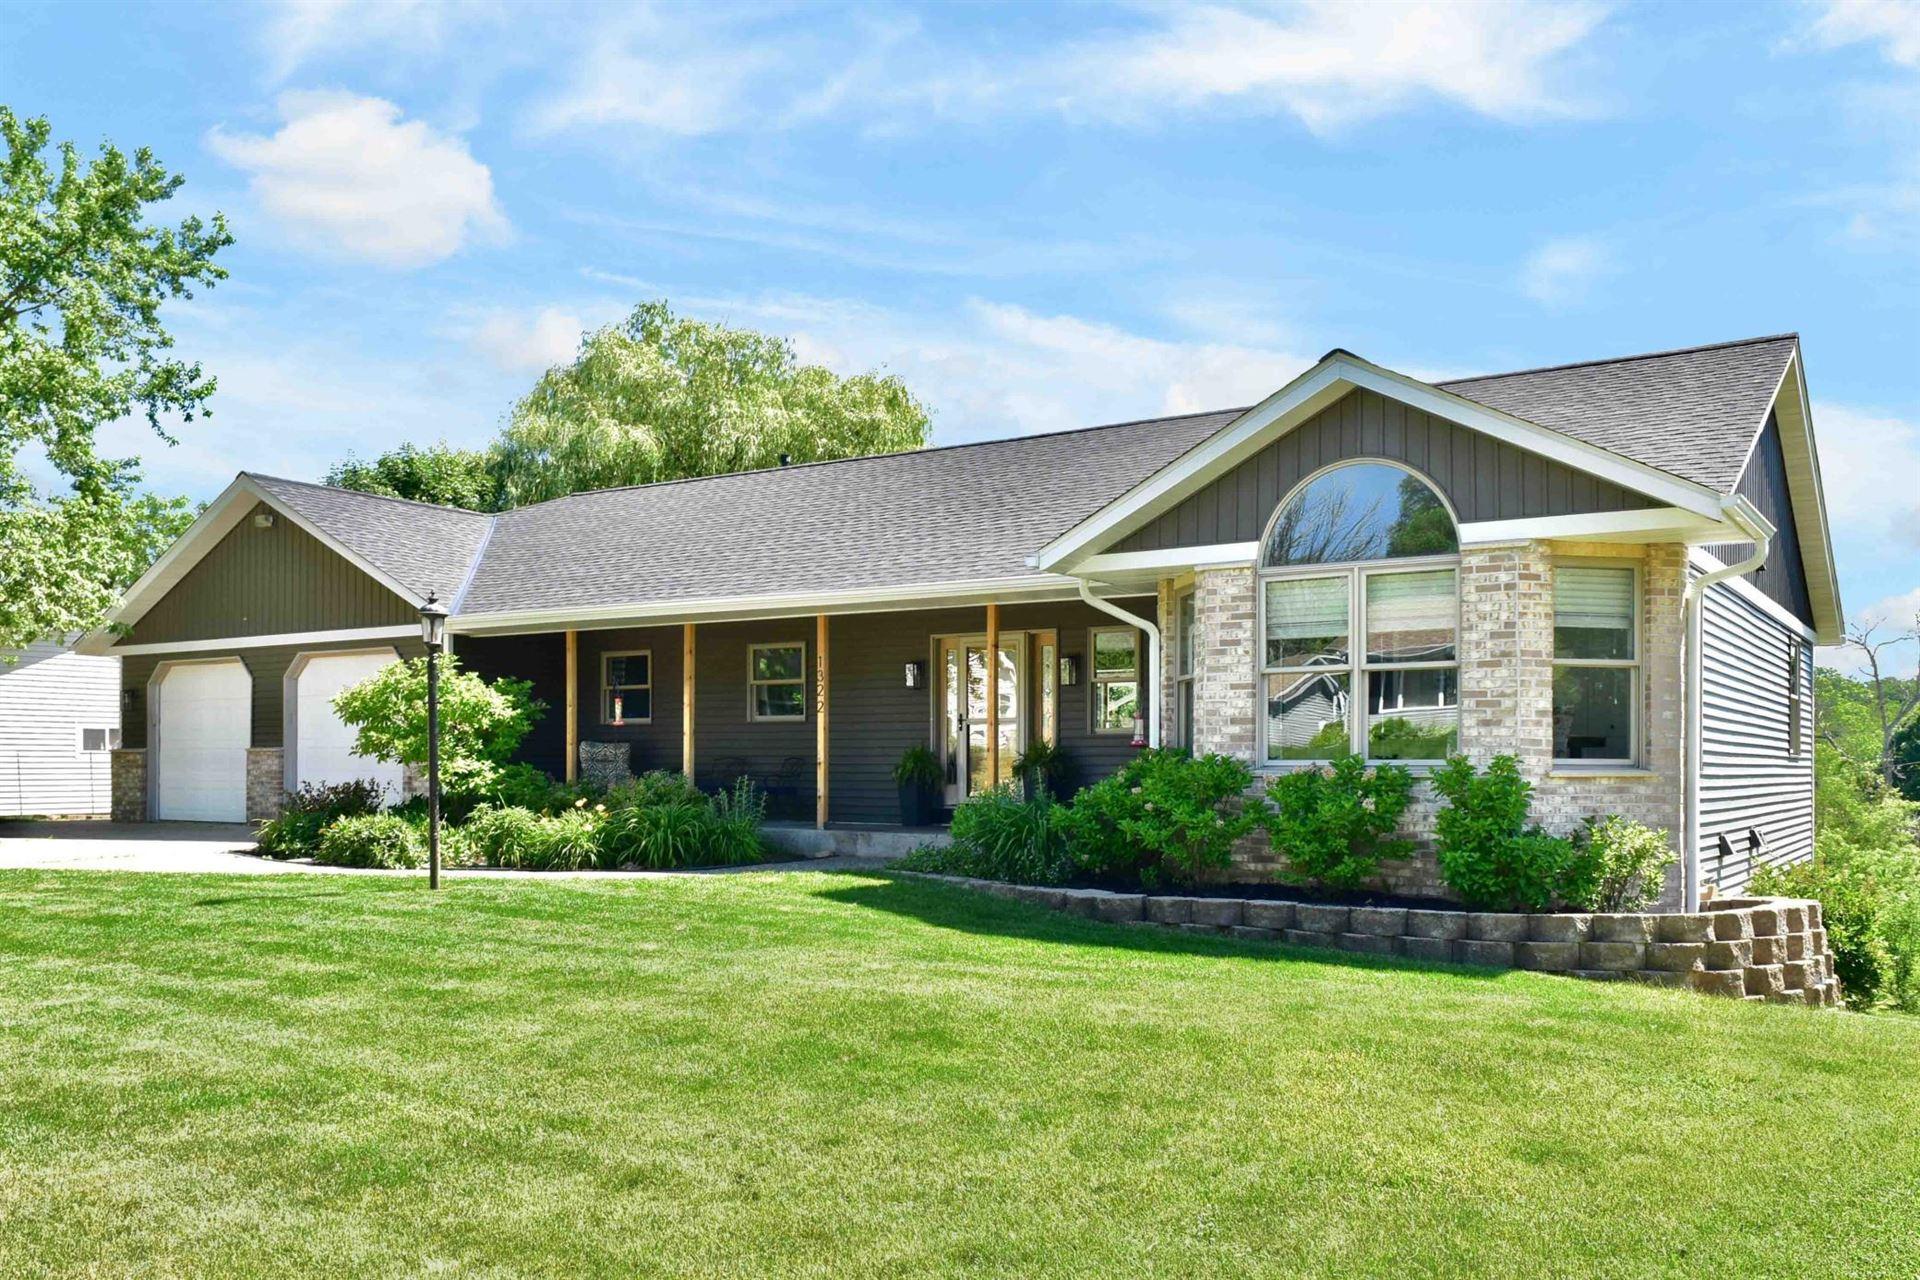 1322 Wincrest Drive, Winona, MN 55987 - MLS#: 6009391